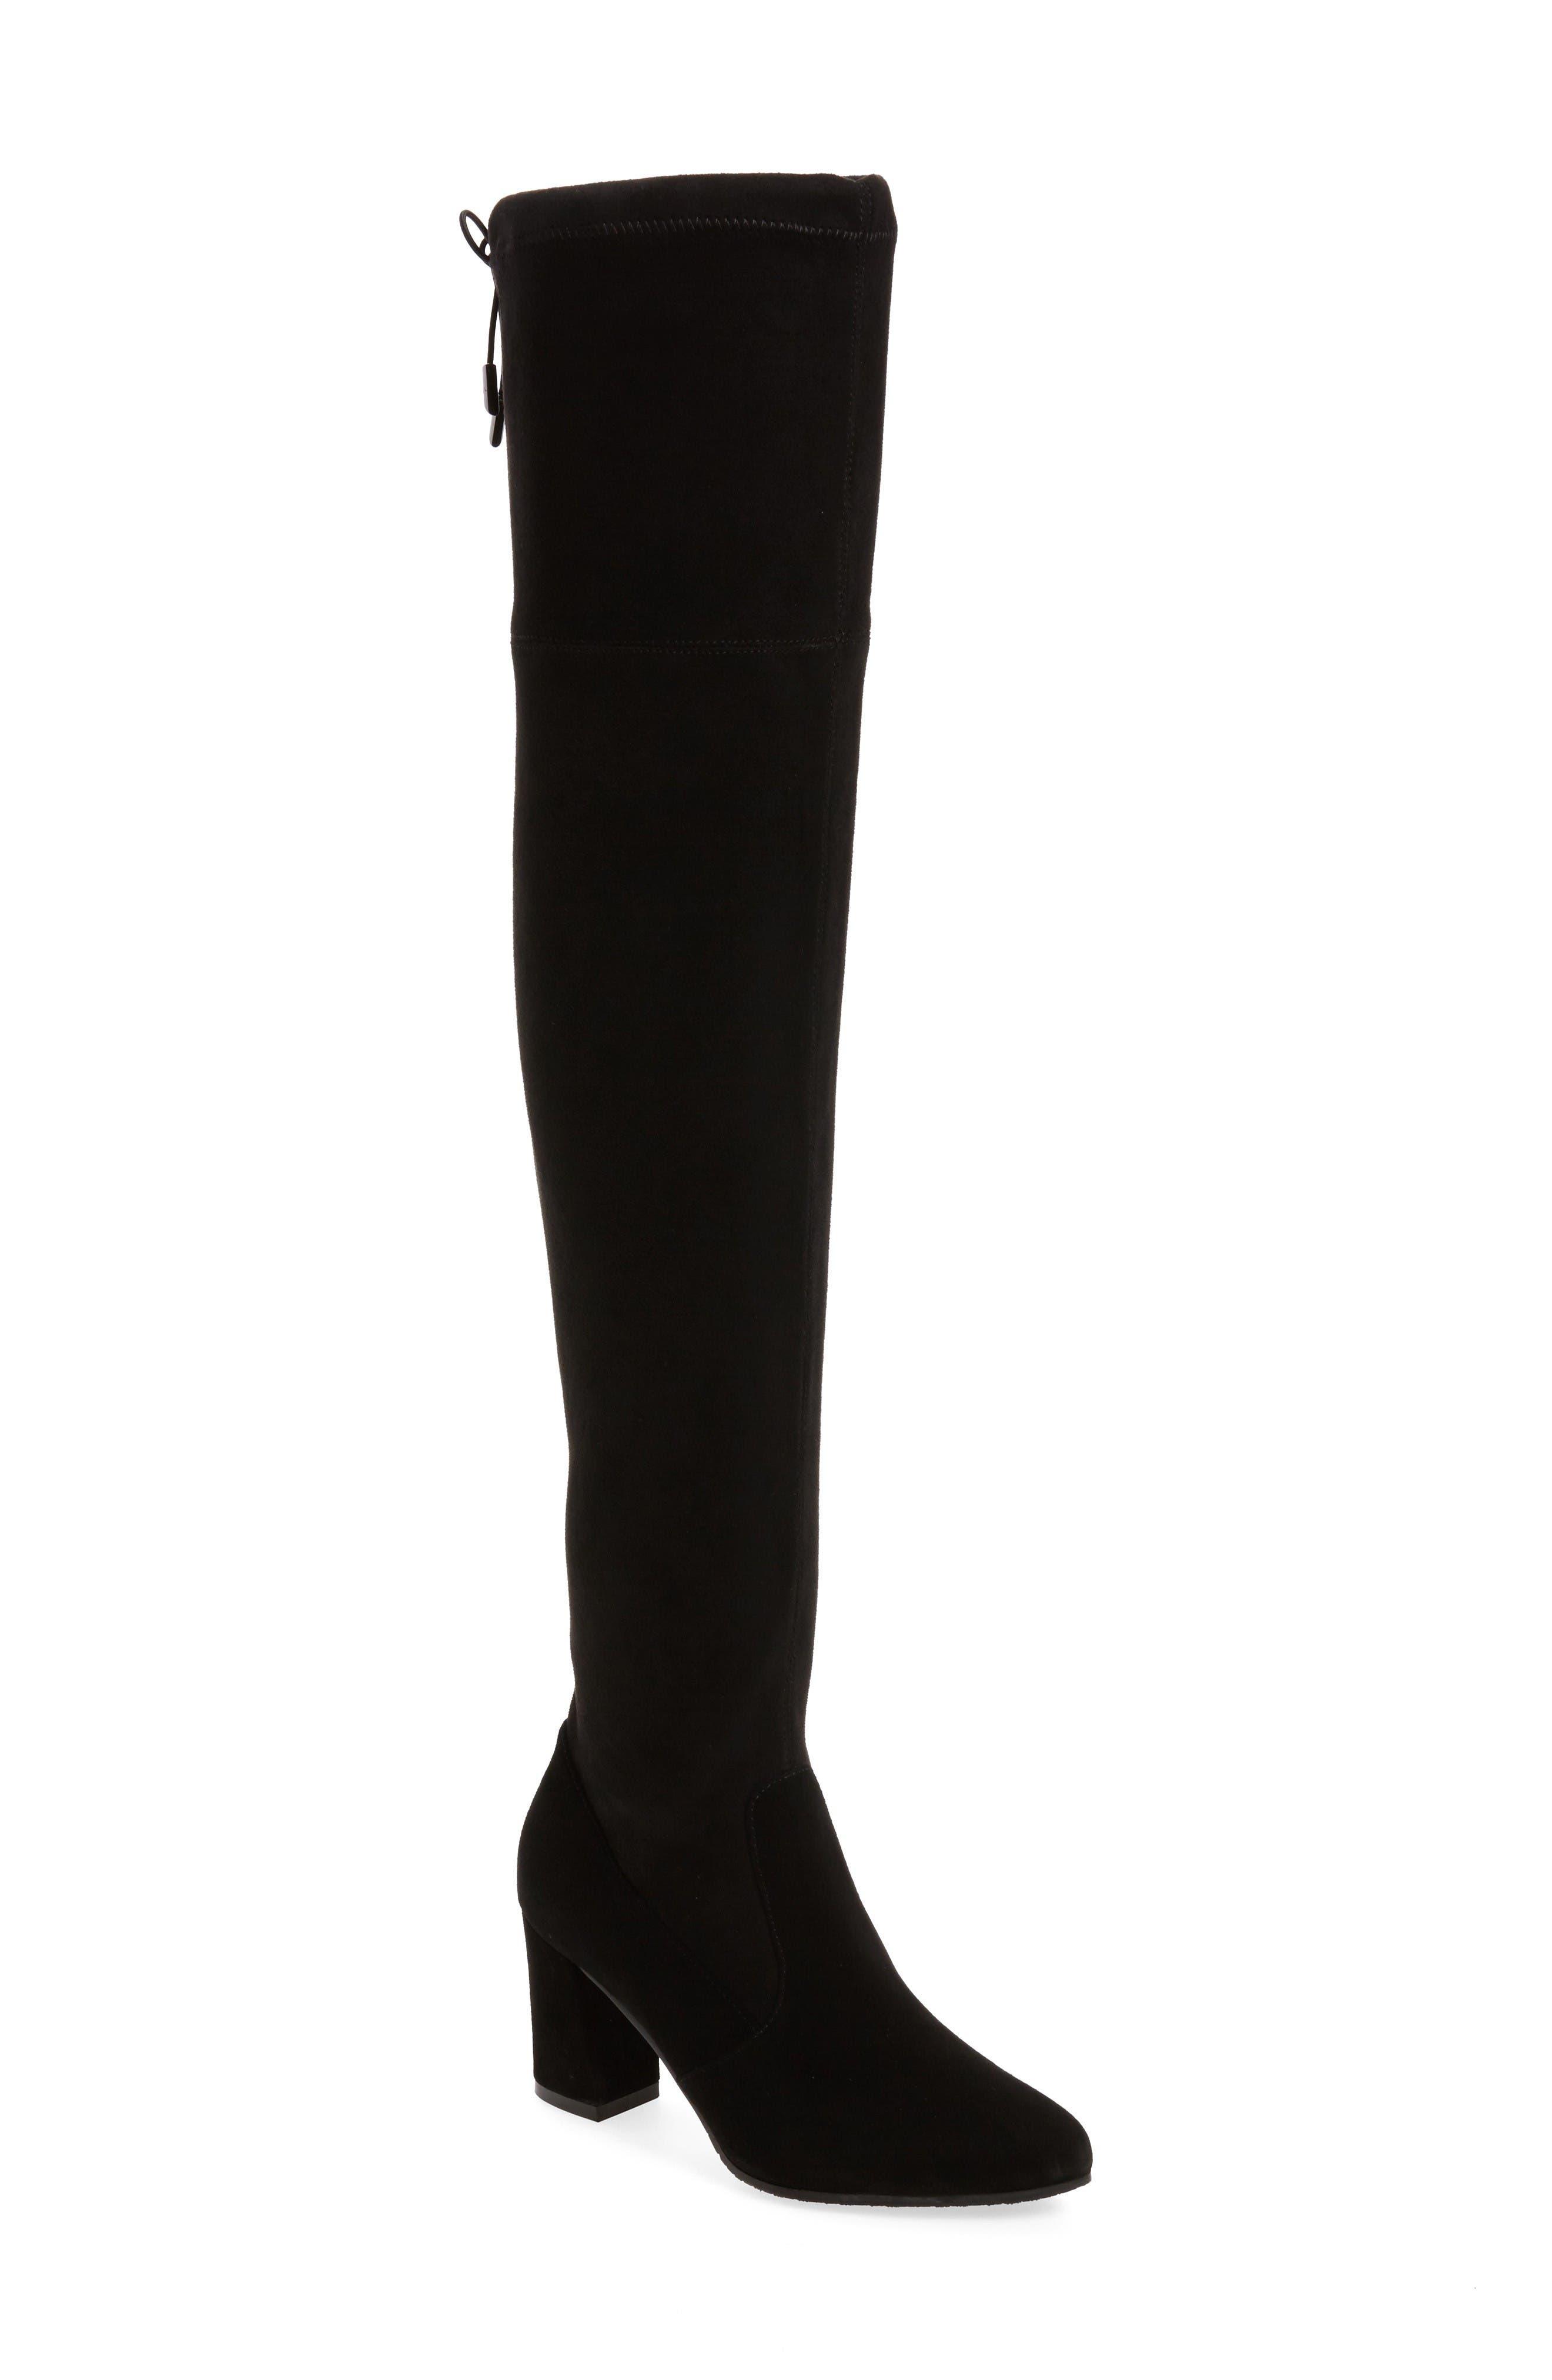 Blondo Taras Over the Knee Waterproof Boot (Women)